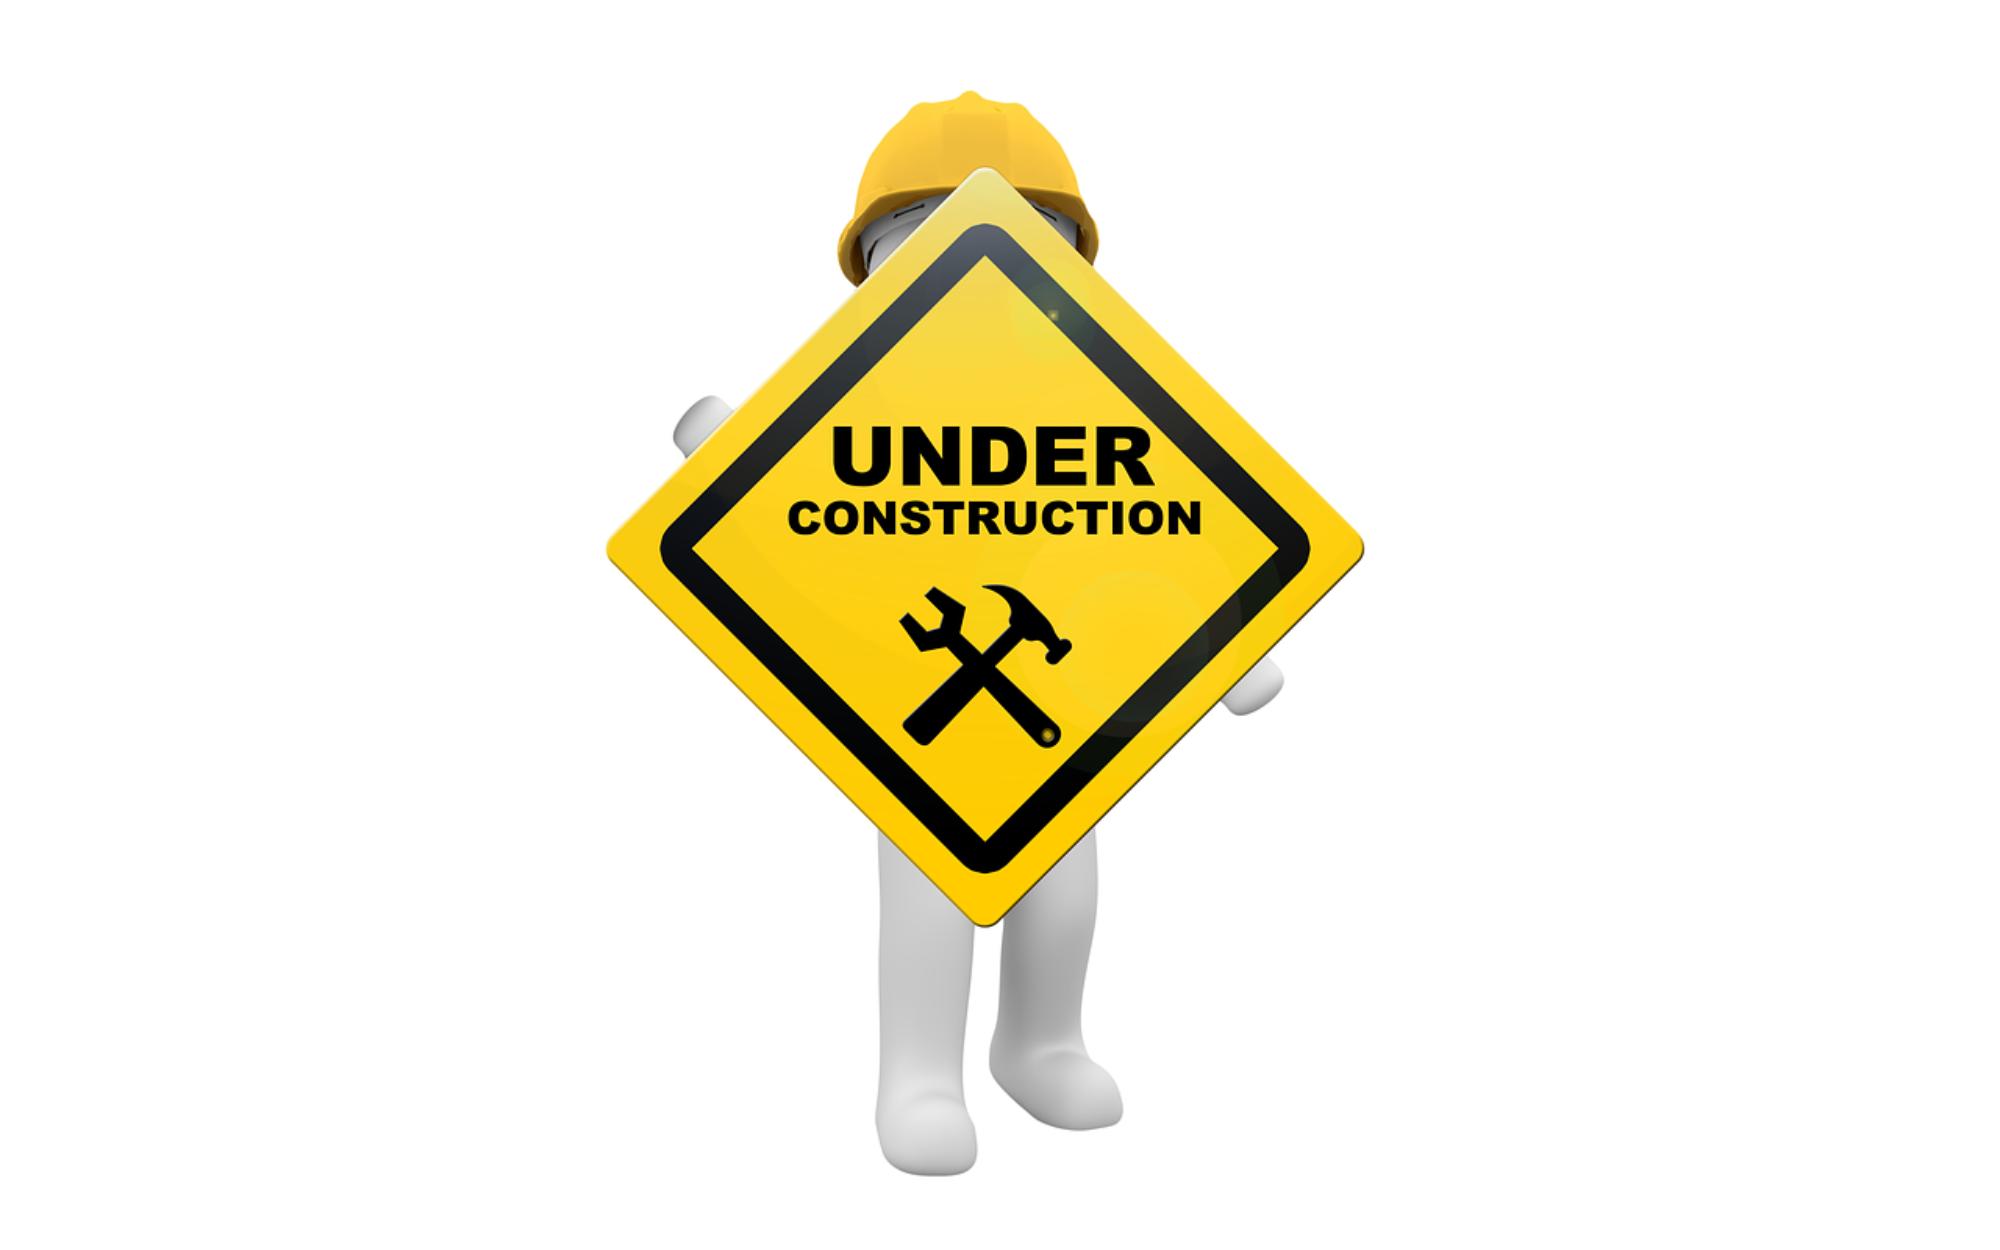 maintenance-2422173_1280